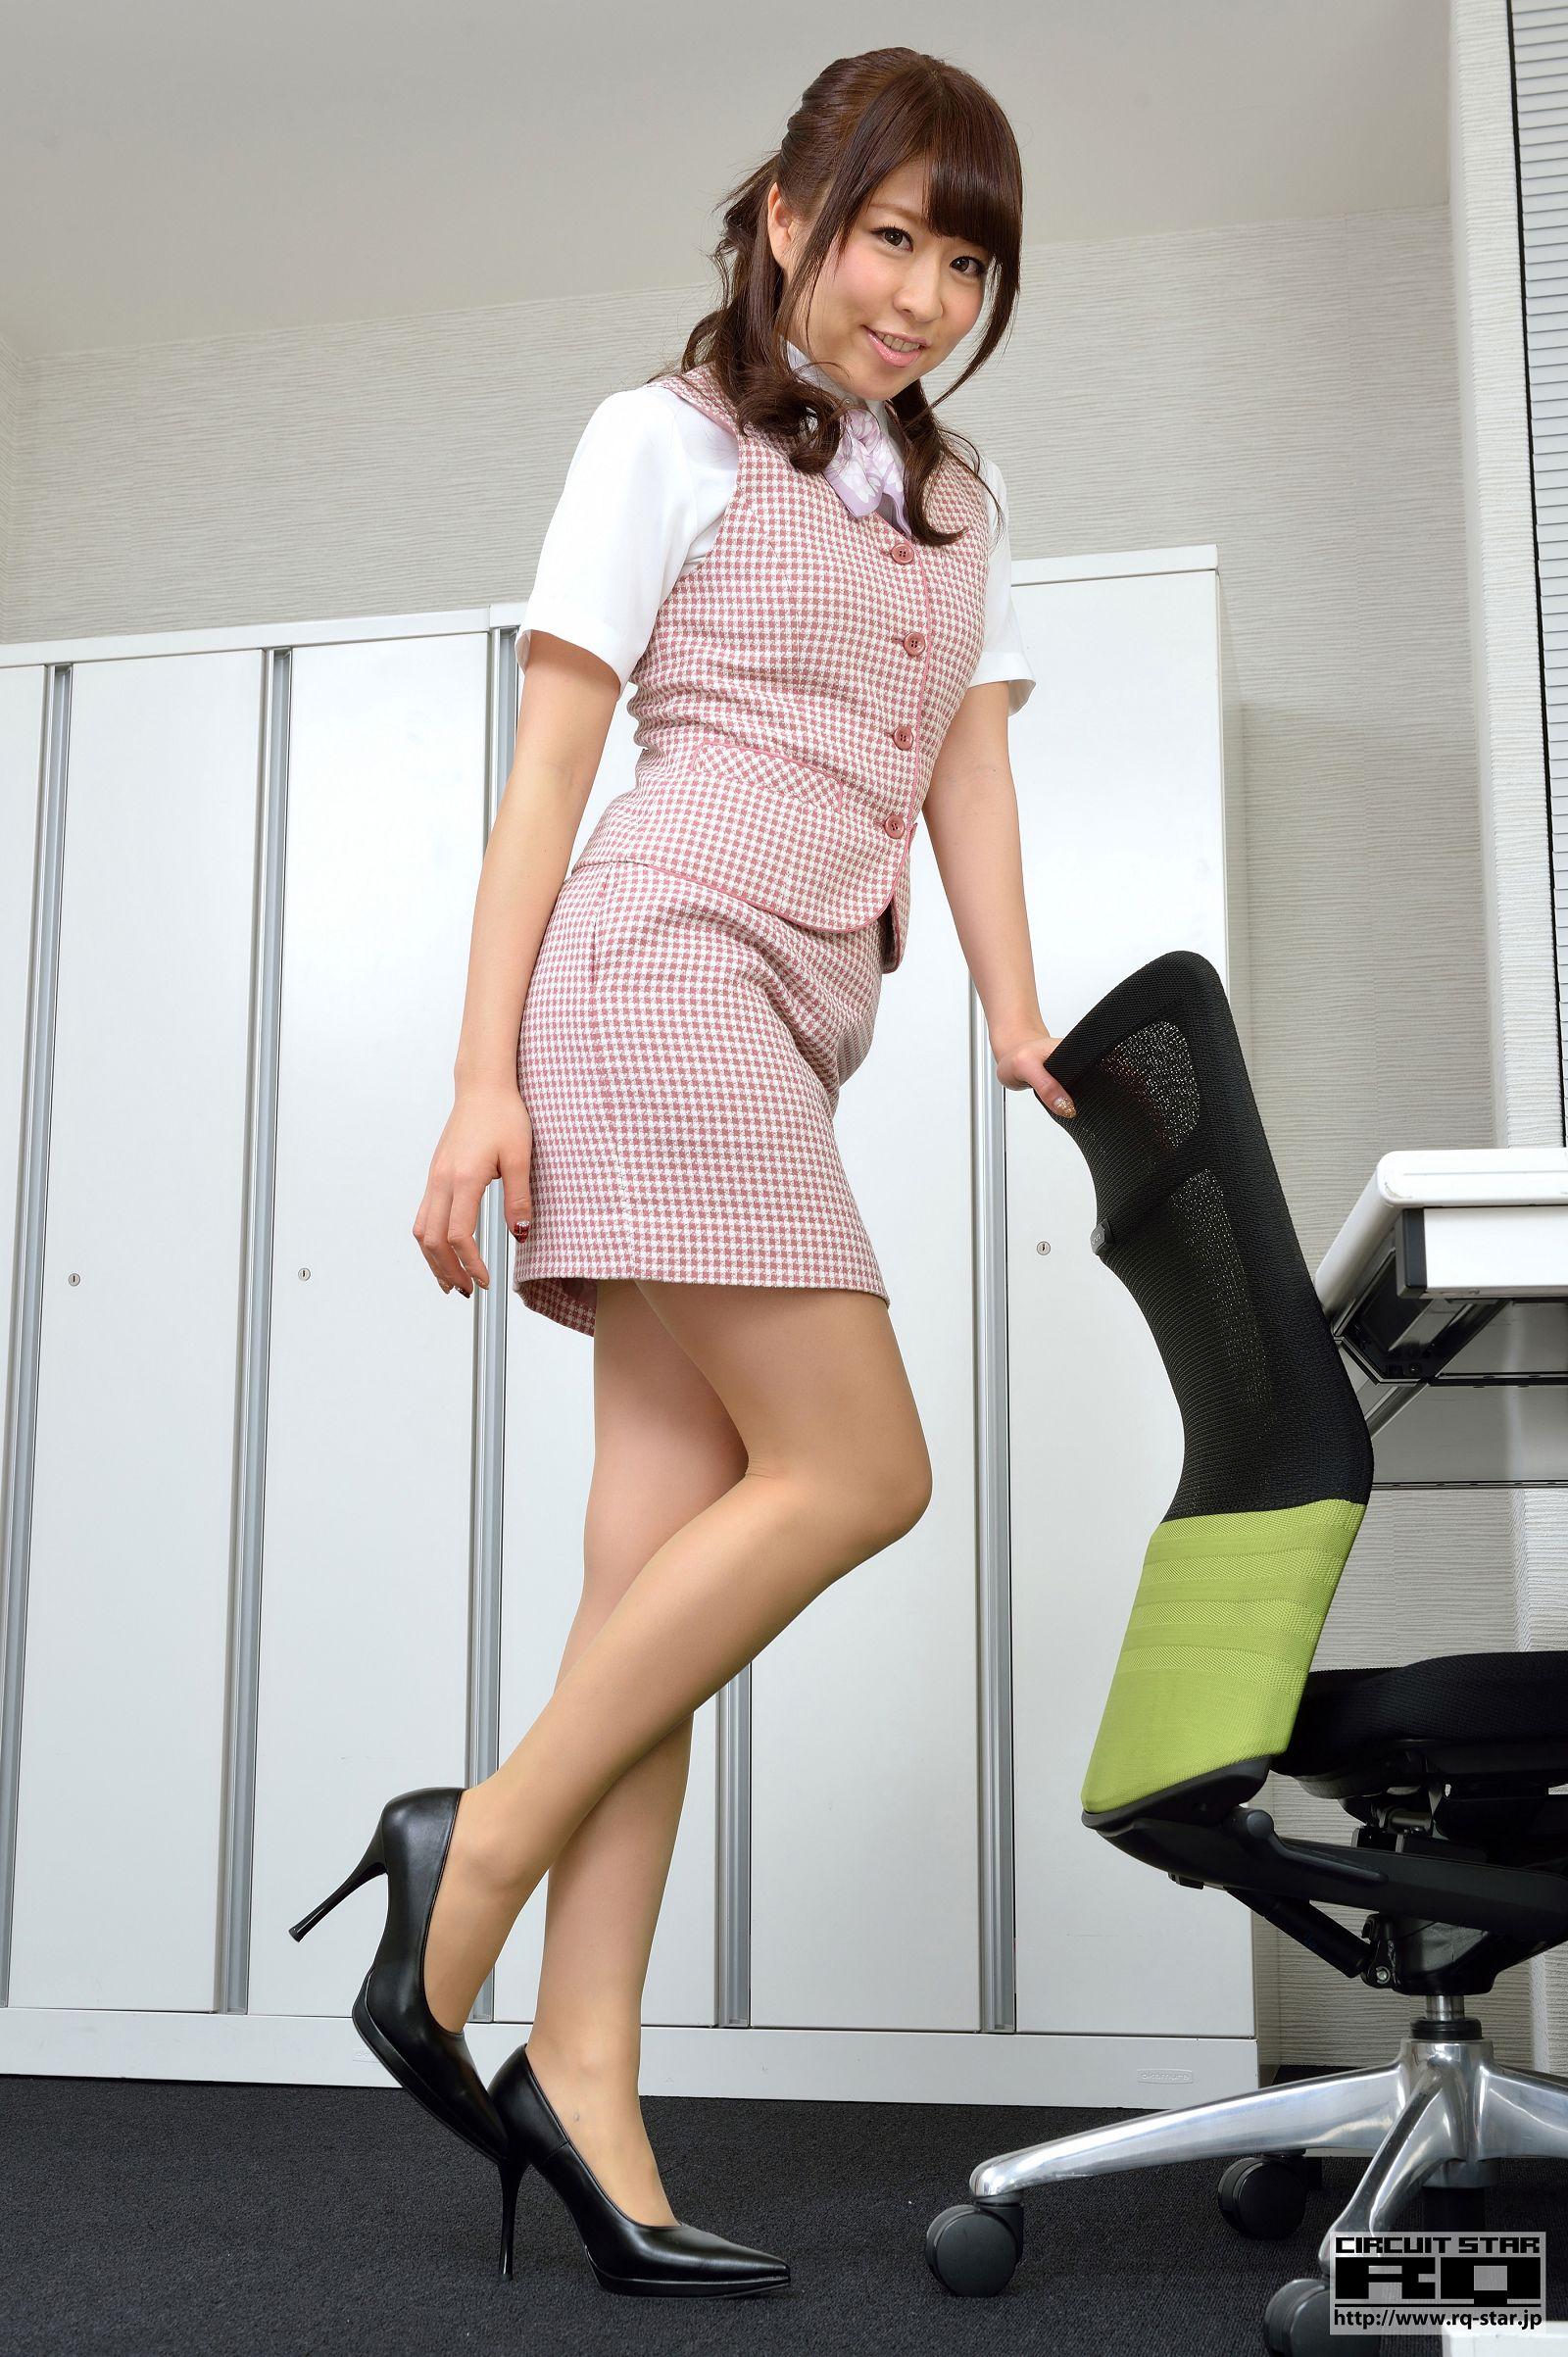 [RQ STAR美女] NO.00899 Miyu Mamiya 間宮美憂 Office Lady[80P] RQ STAR 第1张